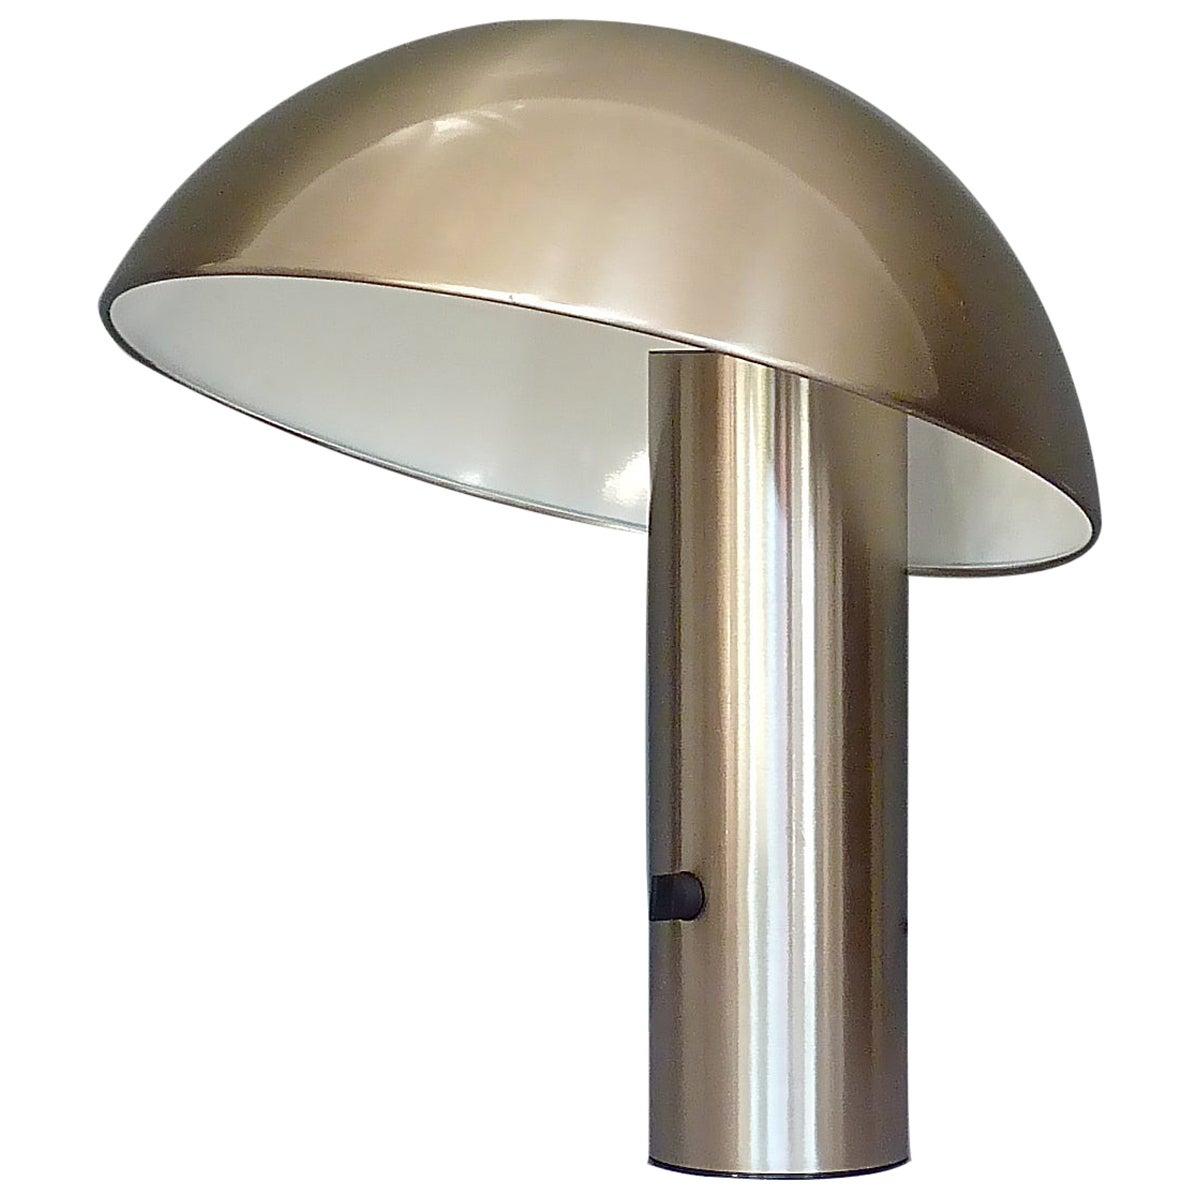 Signed Valenti Vaga Table Lamp by Franco Mirenzi Brushed Steel, Italian, 1970s